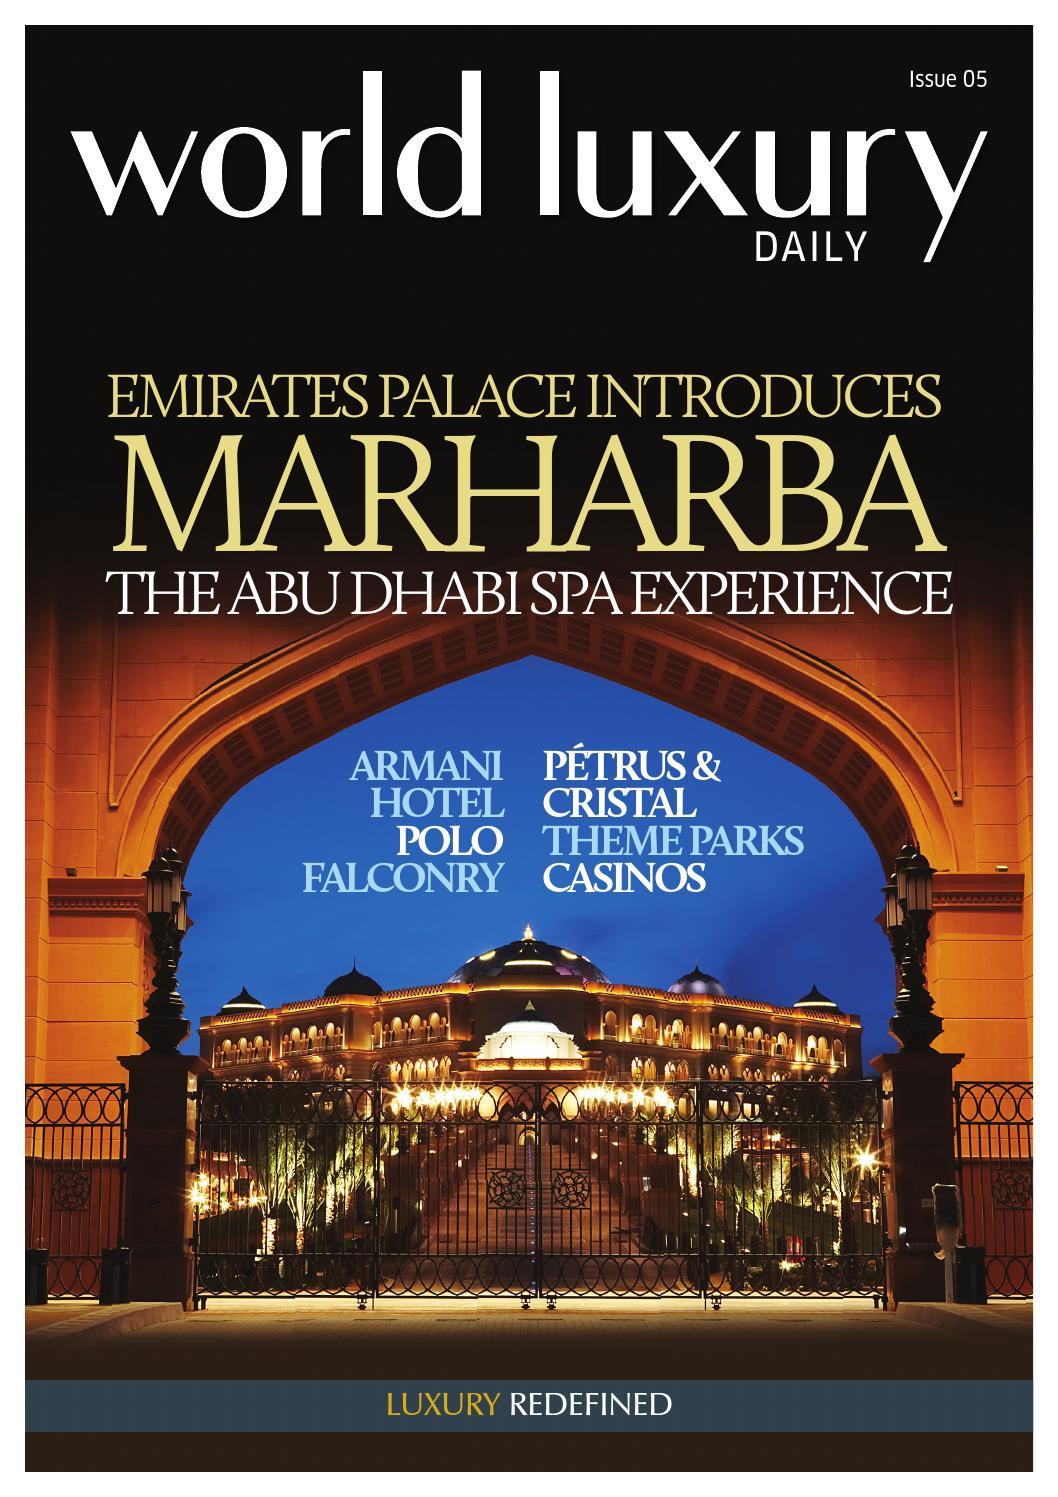 World luxury daily - Magazine cover